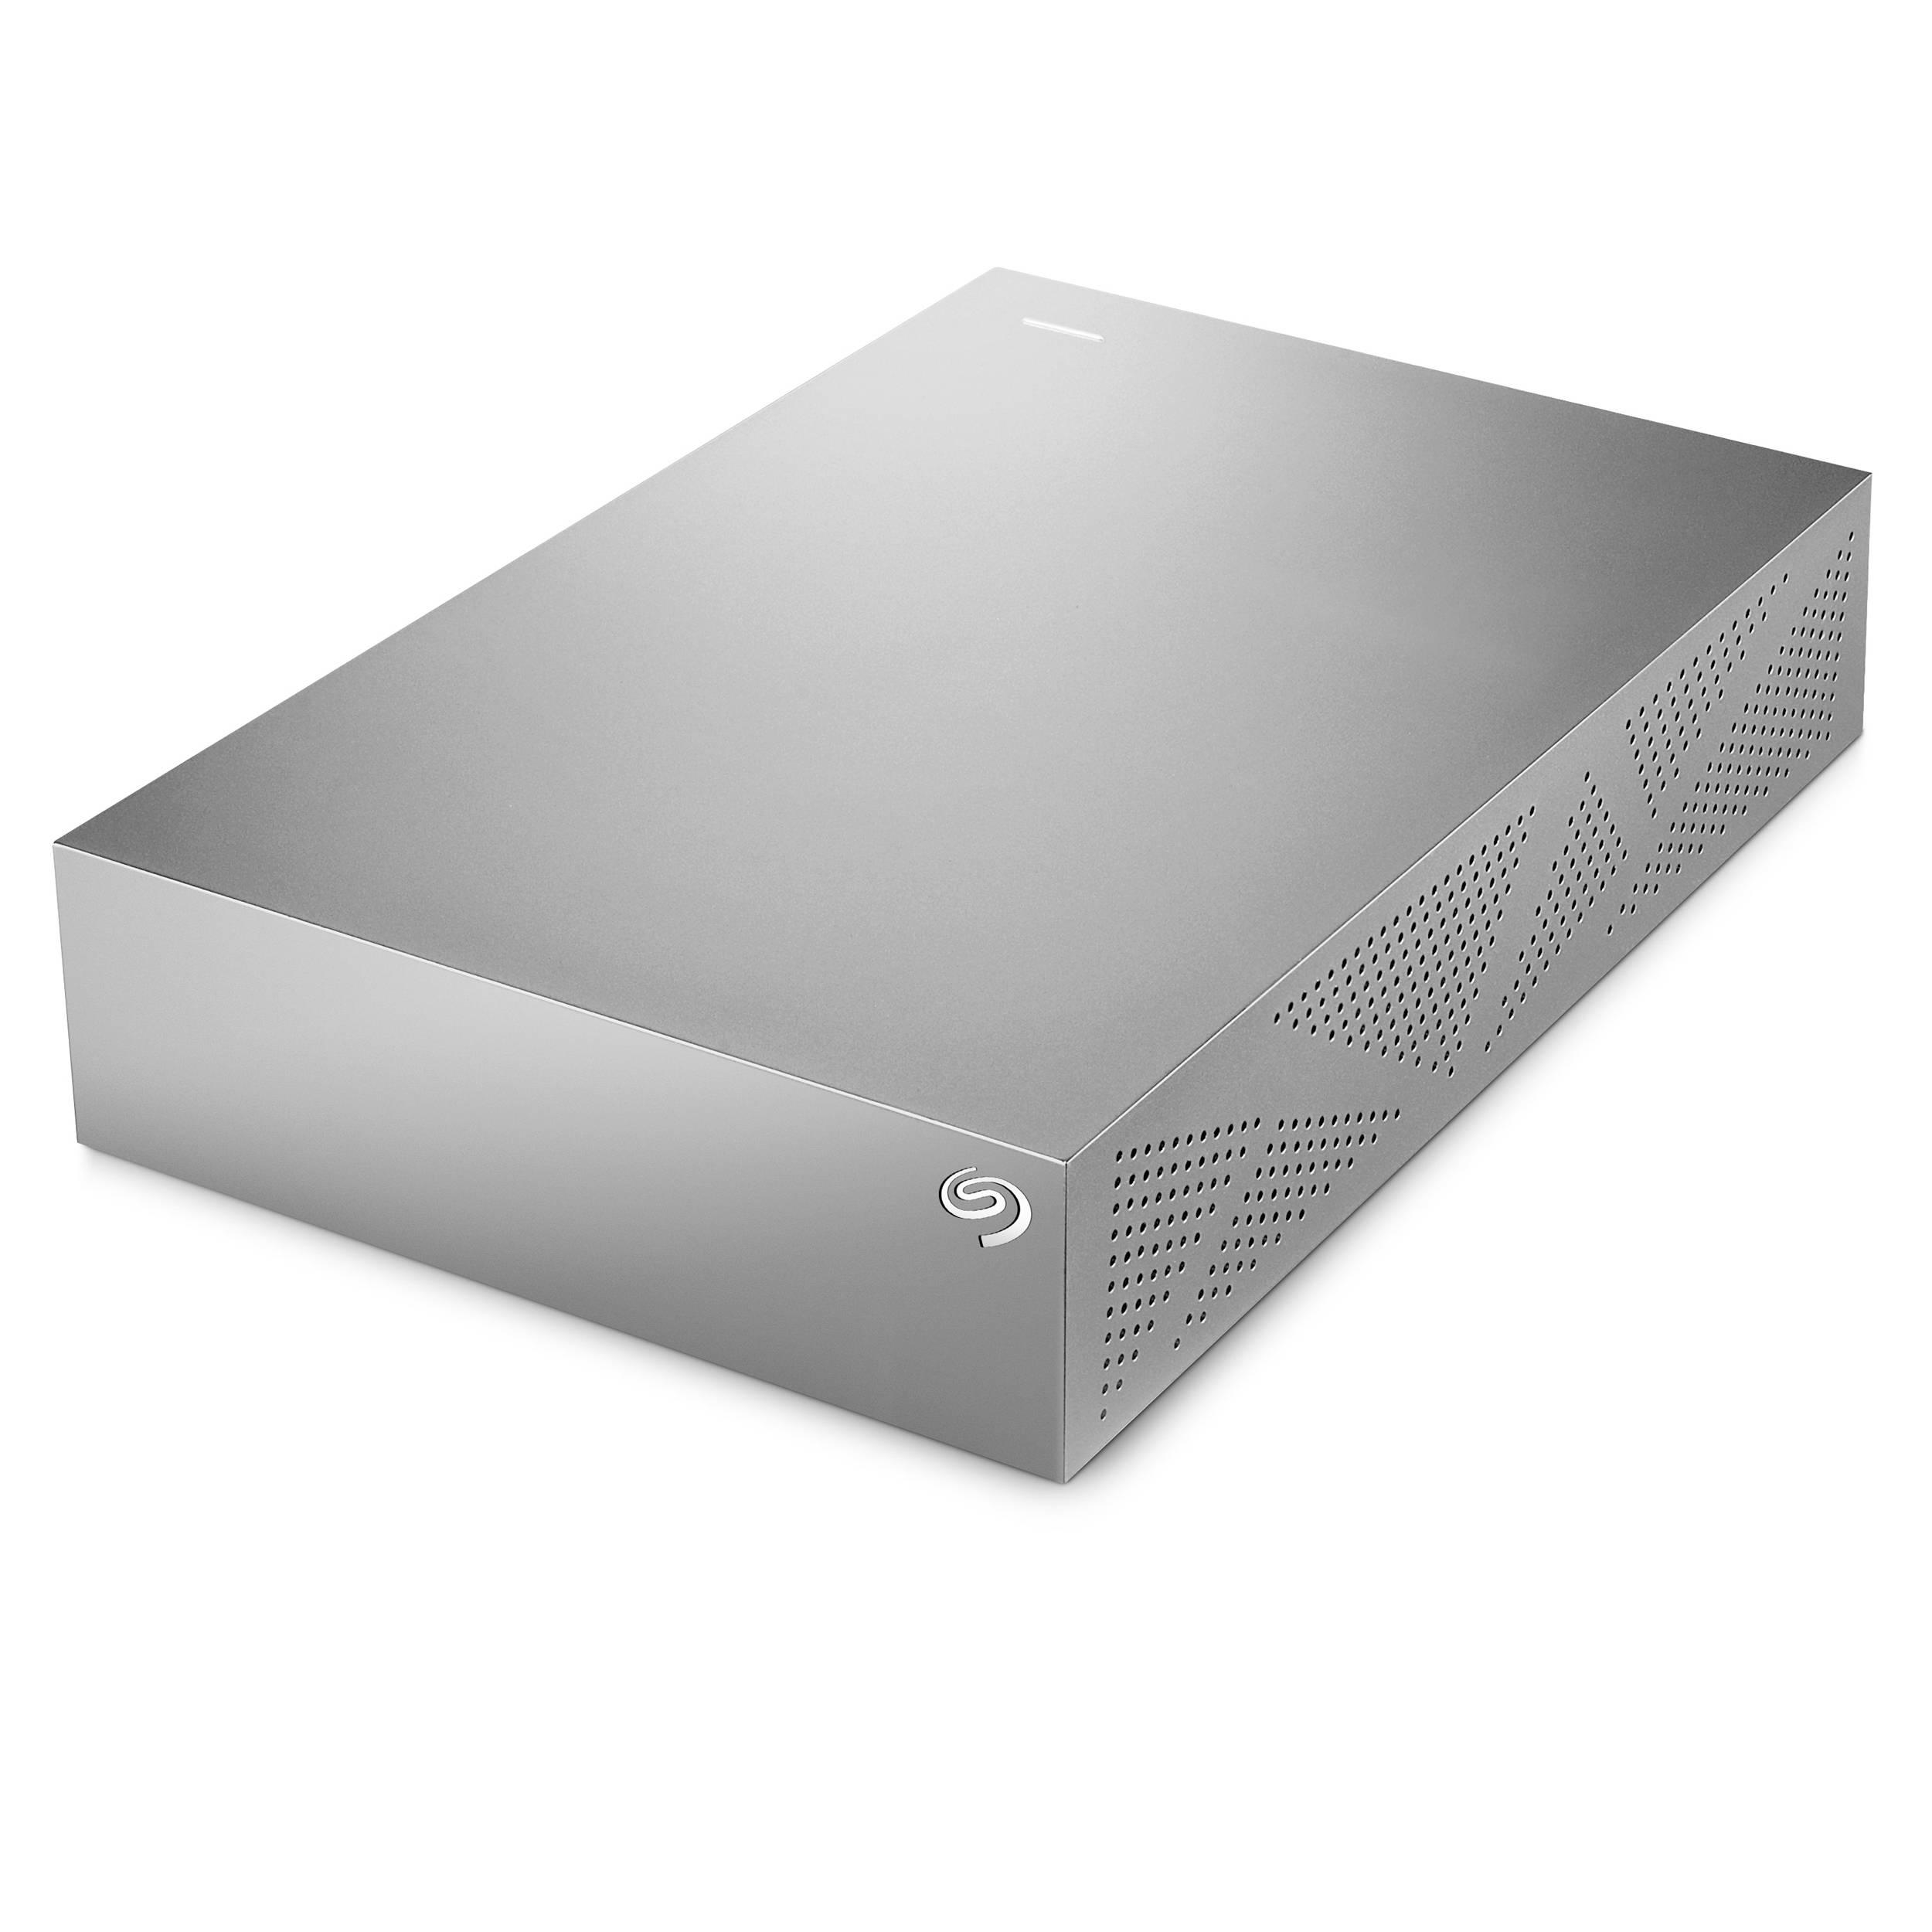 Seagate 3tb backup plus for mac desktop hard drive stdu3000101 for 3tb esterno